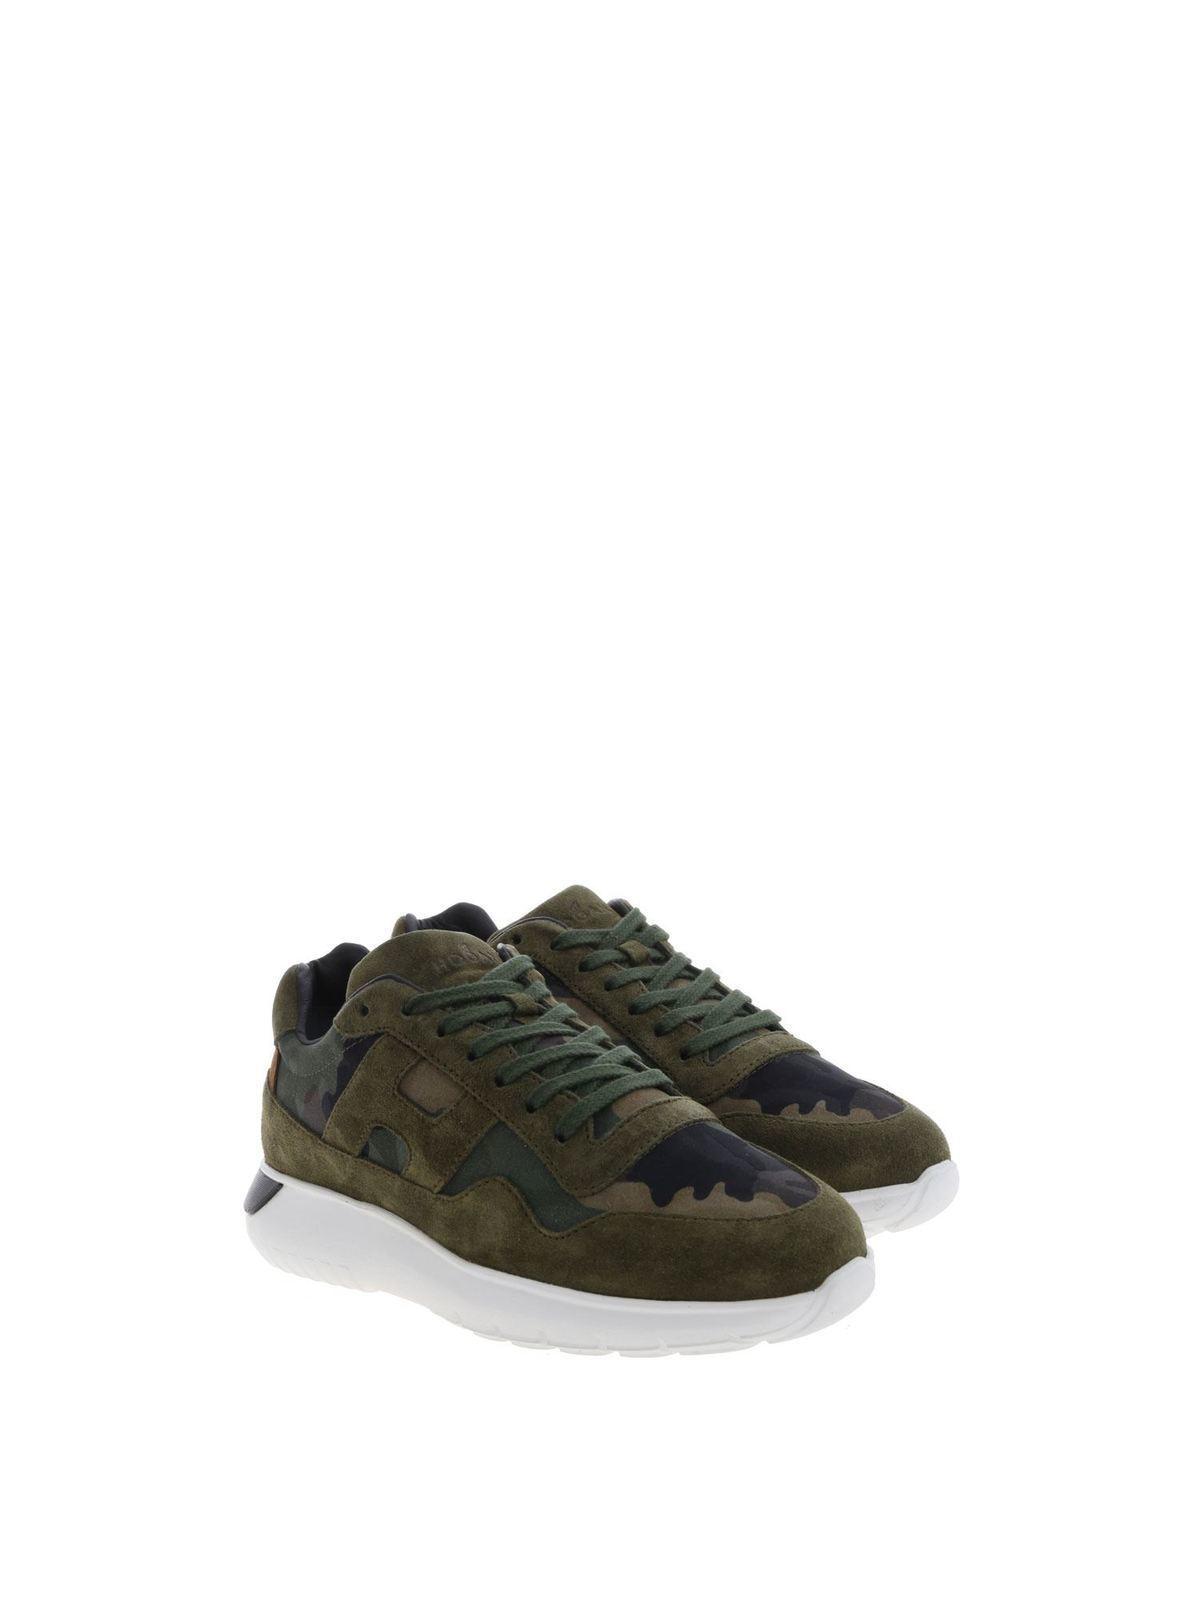 Trainers Hogan Junior - Green camouflage